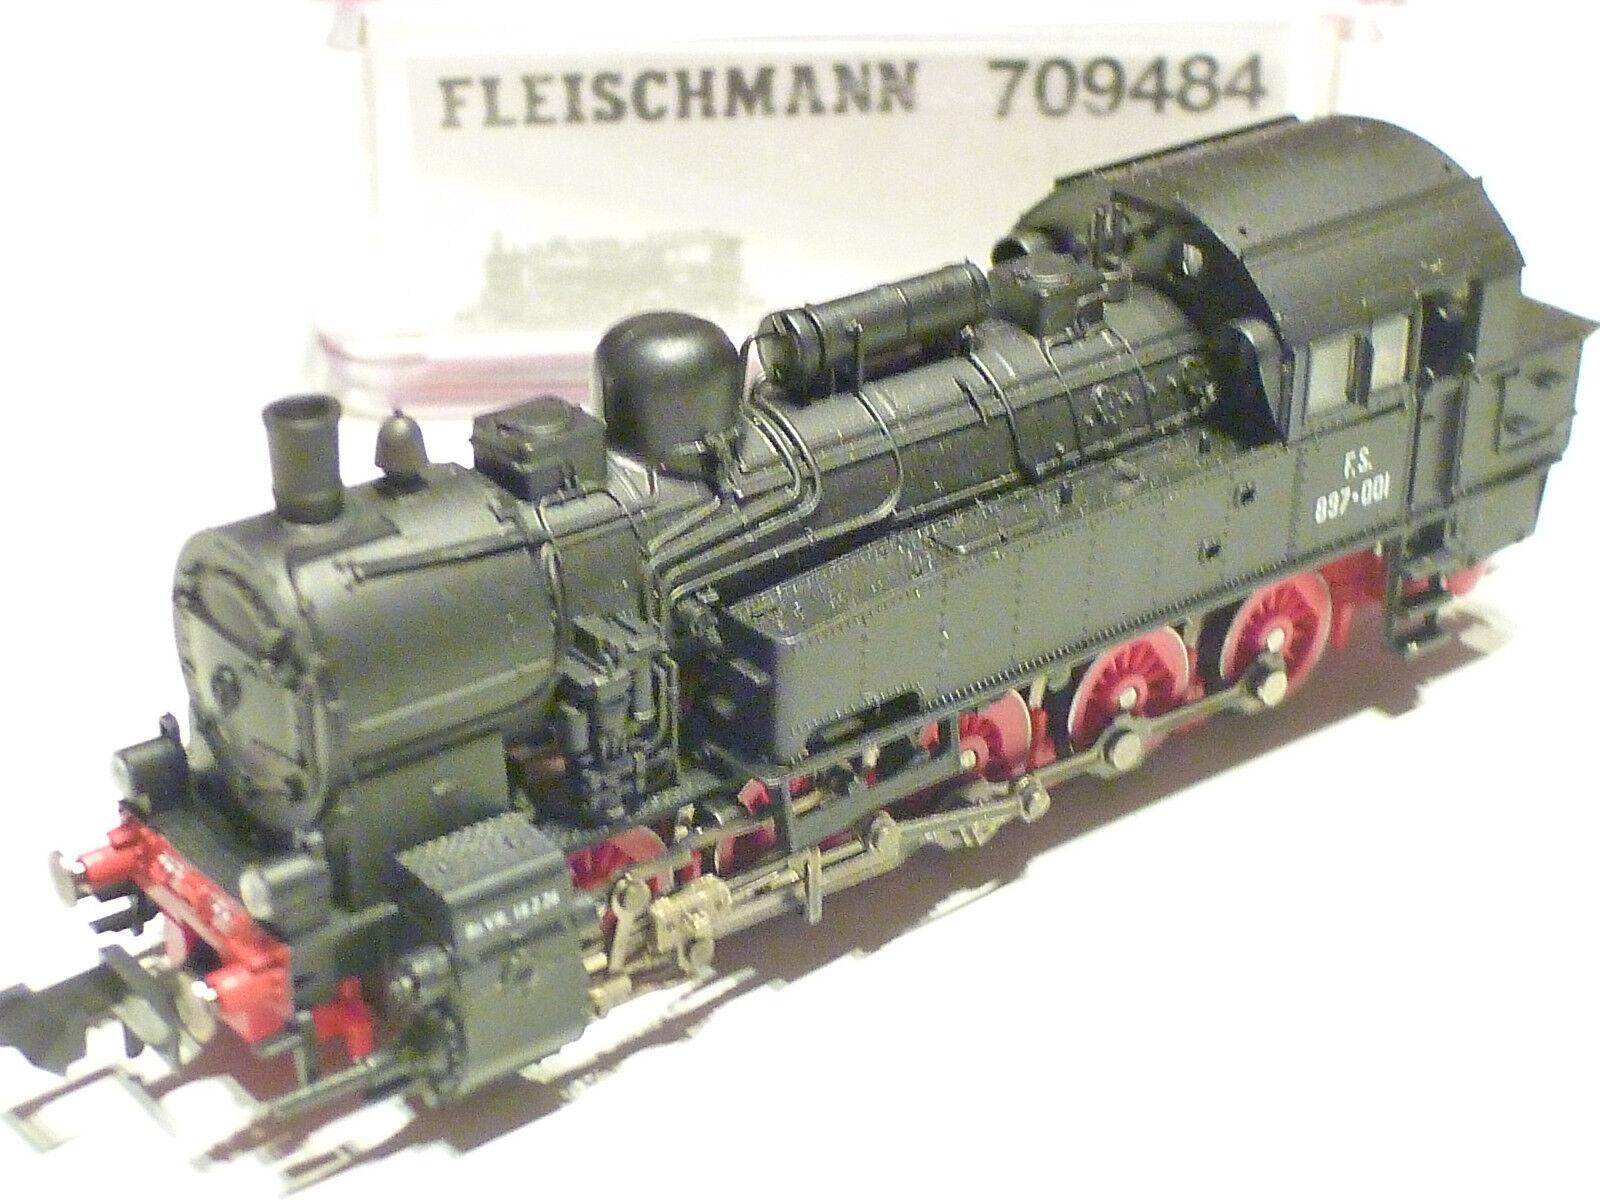 Fleischmann n FS 897-001 negro 709484 nuevo embalaje original digital